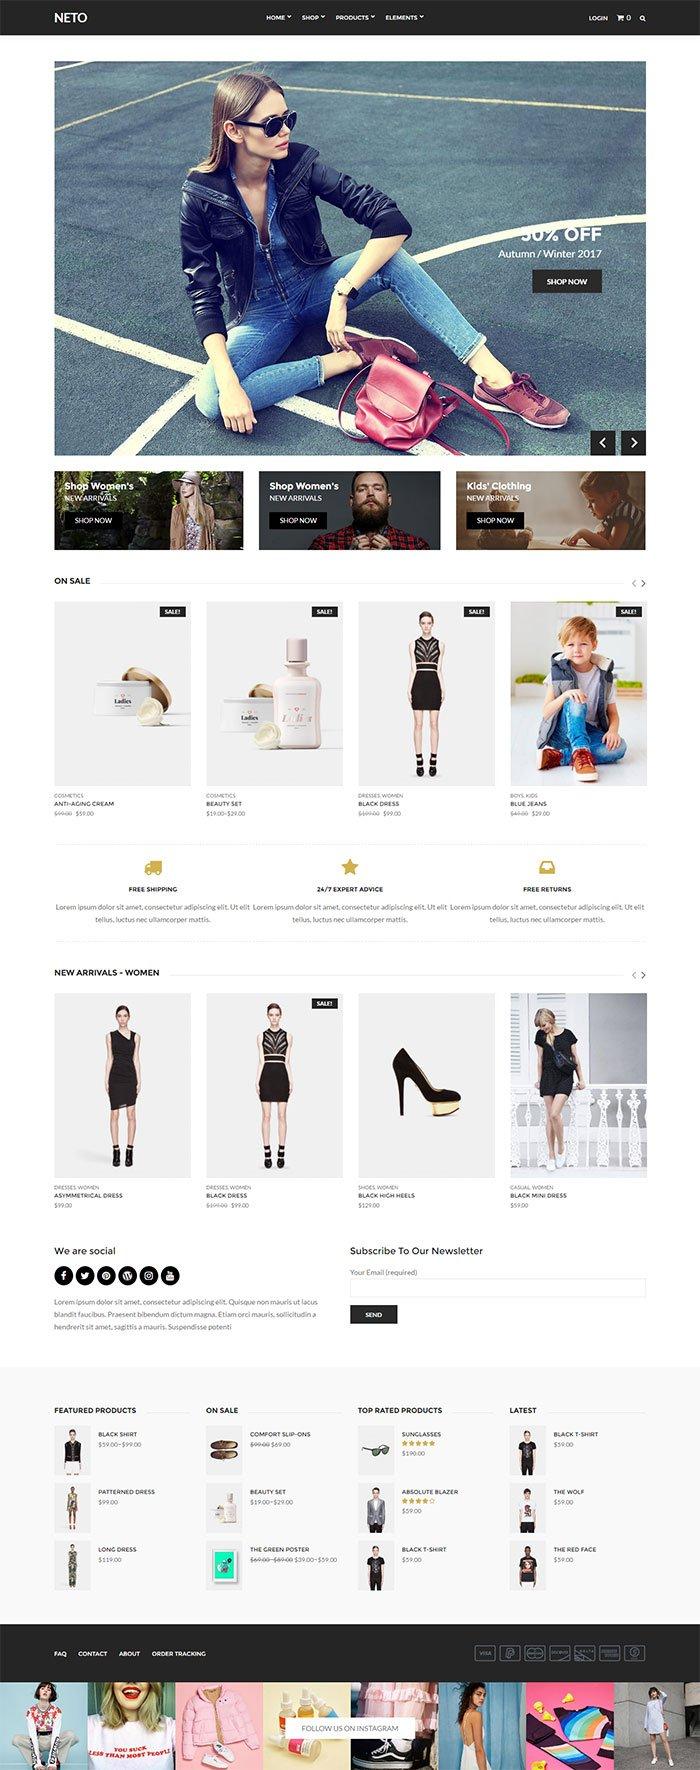 neto-ecommerce-wordpress-theme